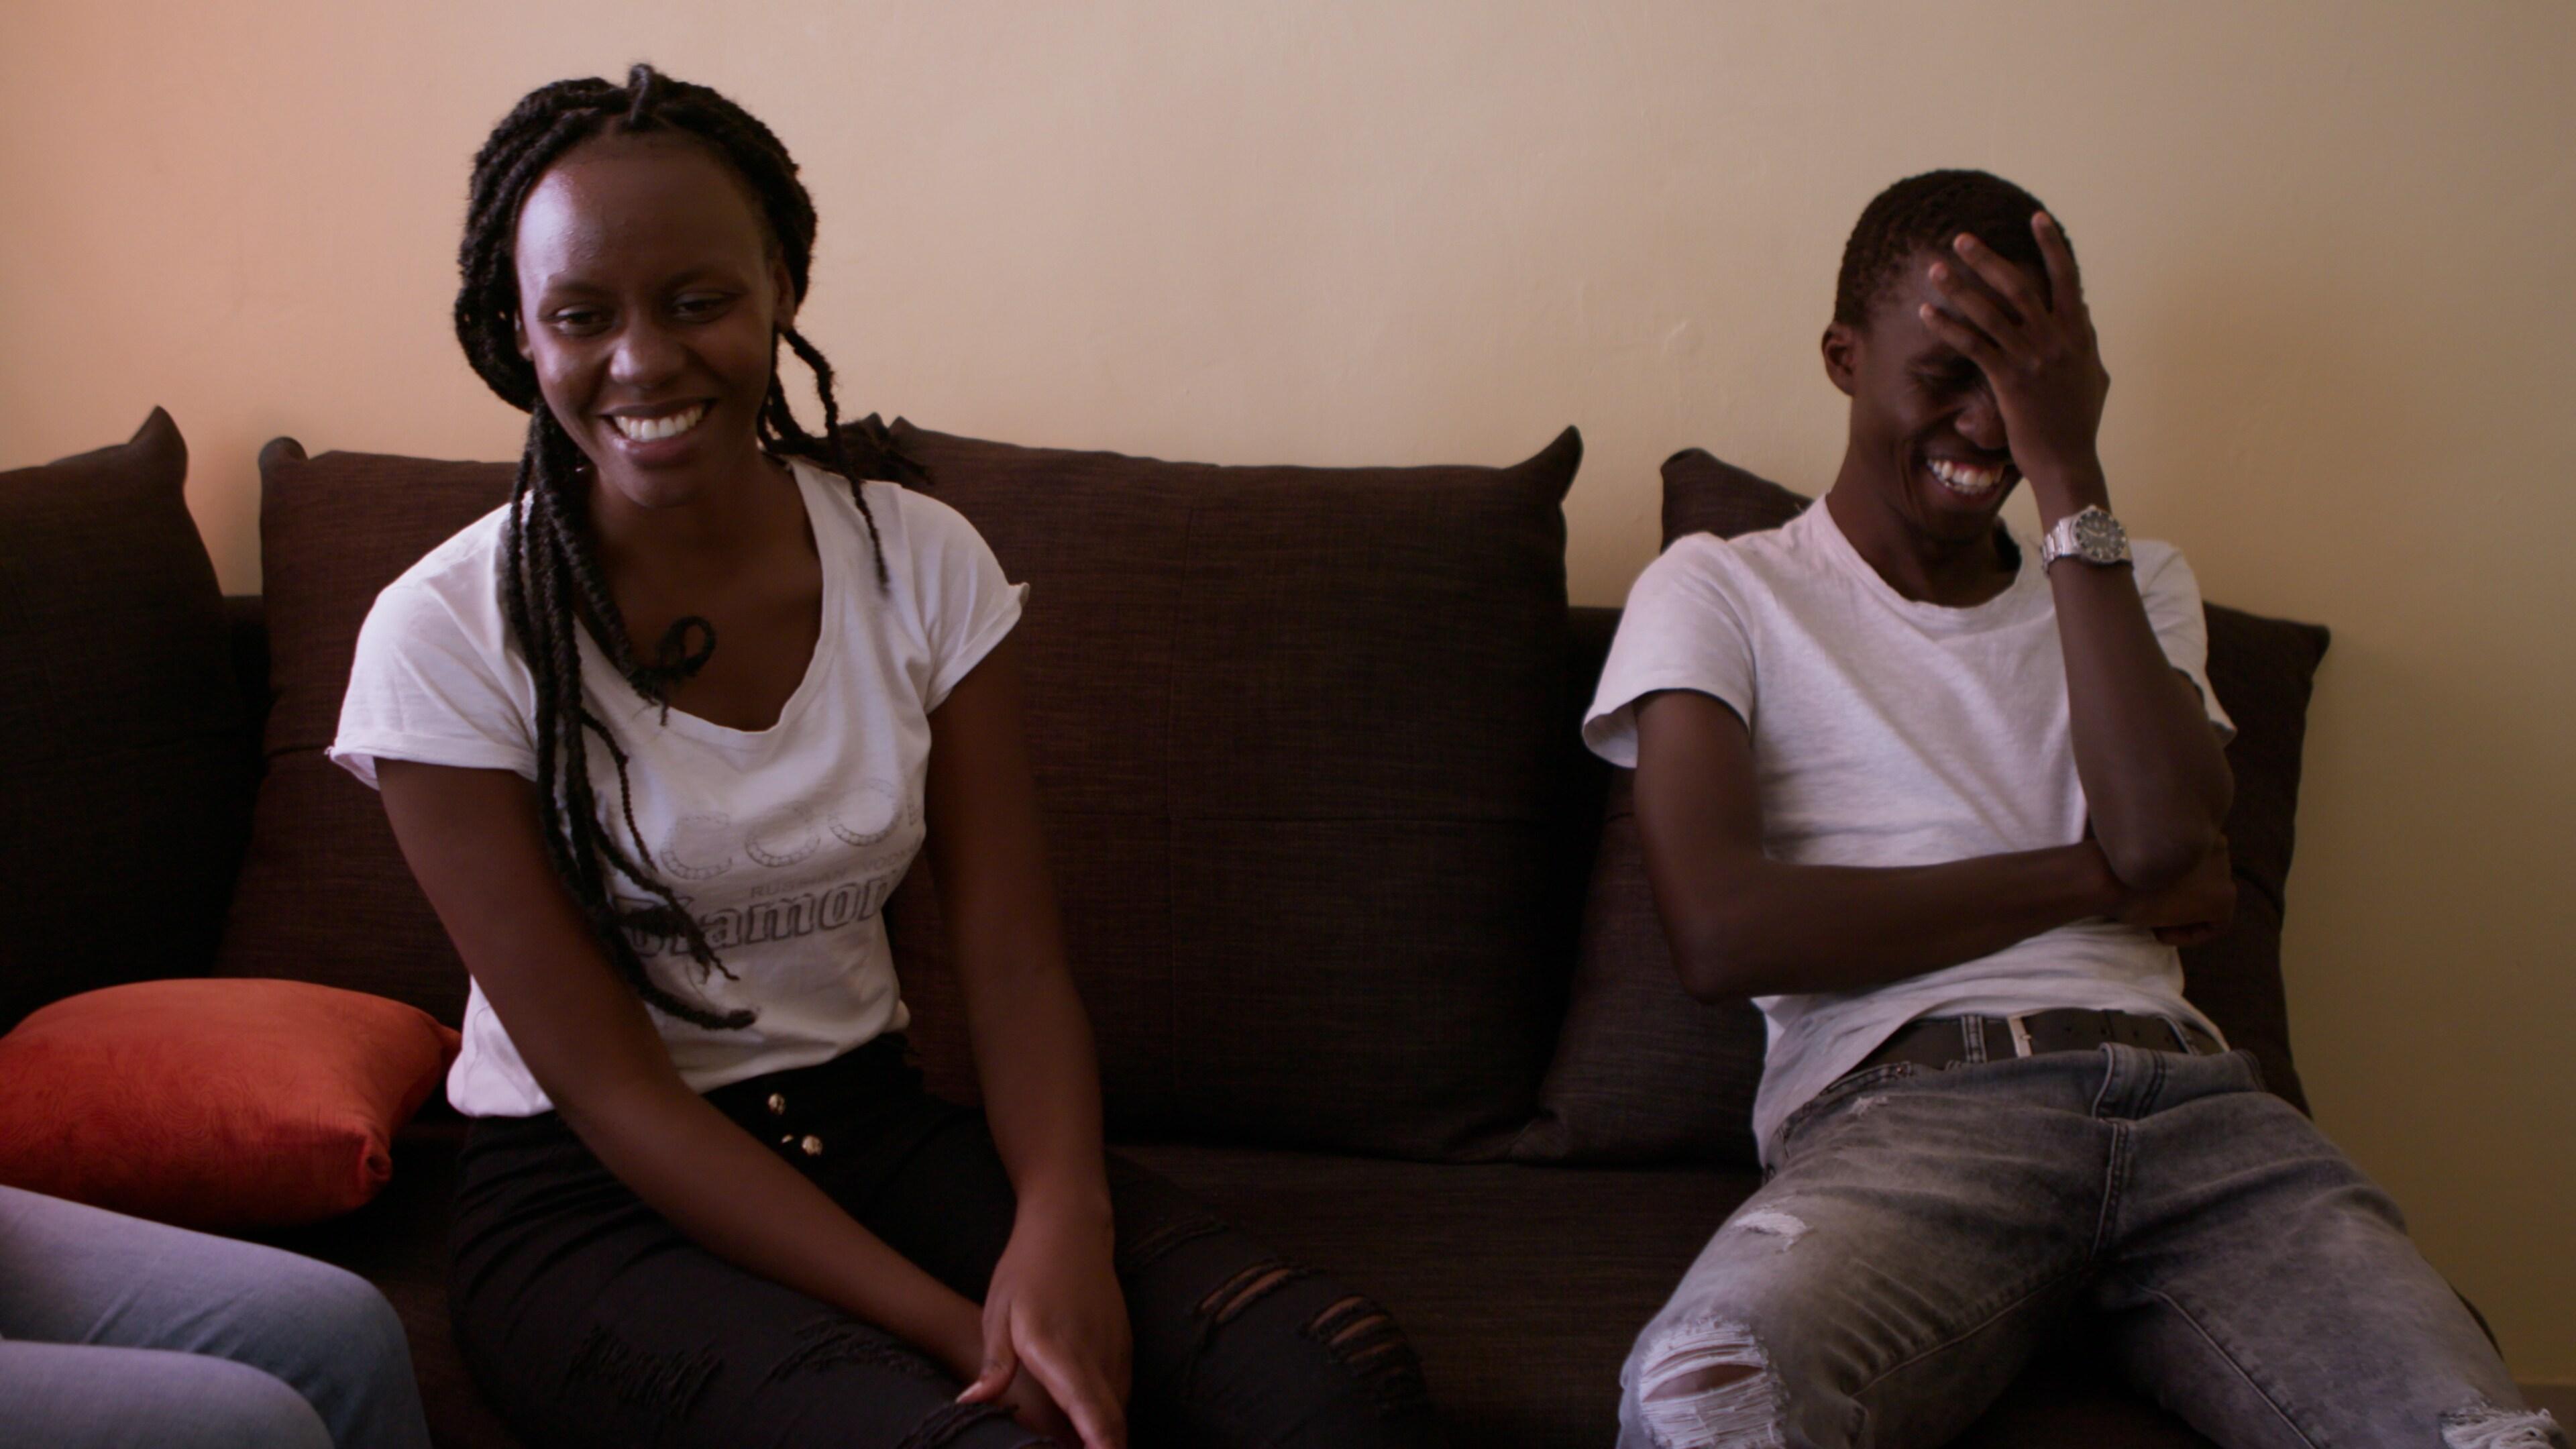 Nairobi, Kenya - Mercy Ndanu Movembi (L) tries to convince her boyfriend, Henry Onyango, to get a haircut. (Credit: Future of Work Film Inc)